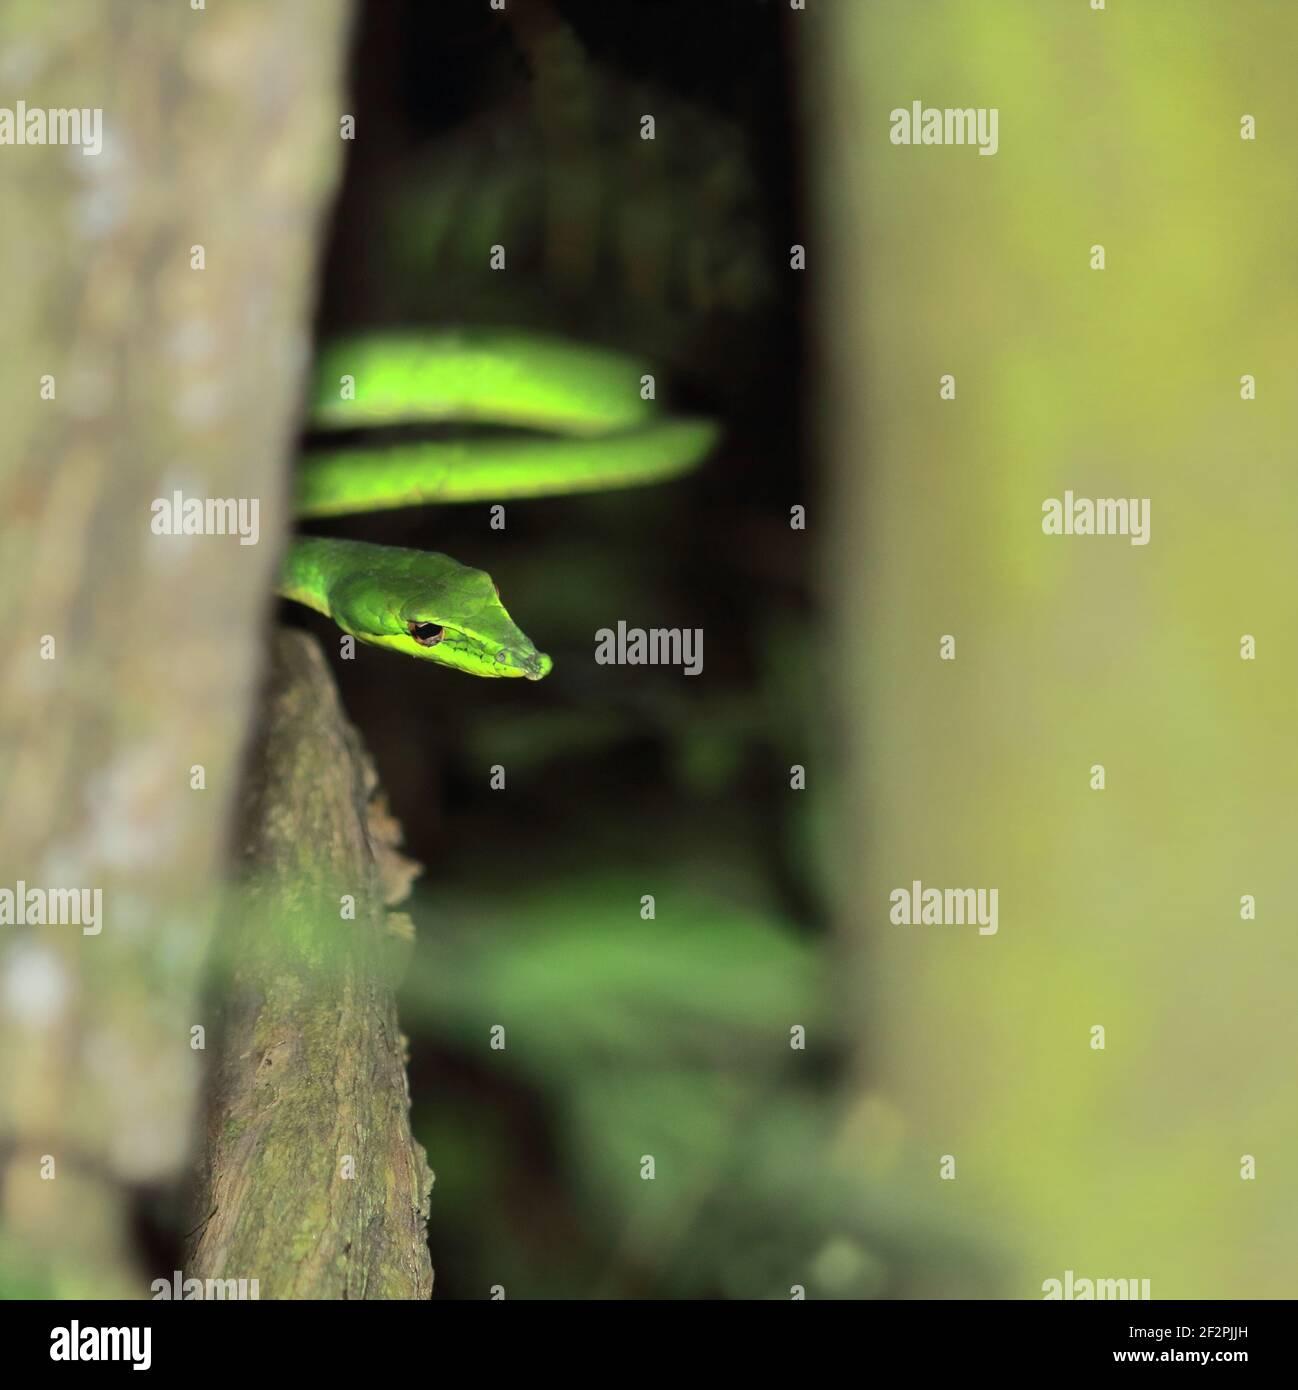 close up view of beautiful but venomous long nosed whip snake or sri lankan green vine snake (ahaetulla nasuta), tropical rainforest in india Stock Photo